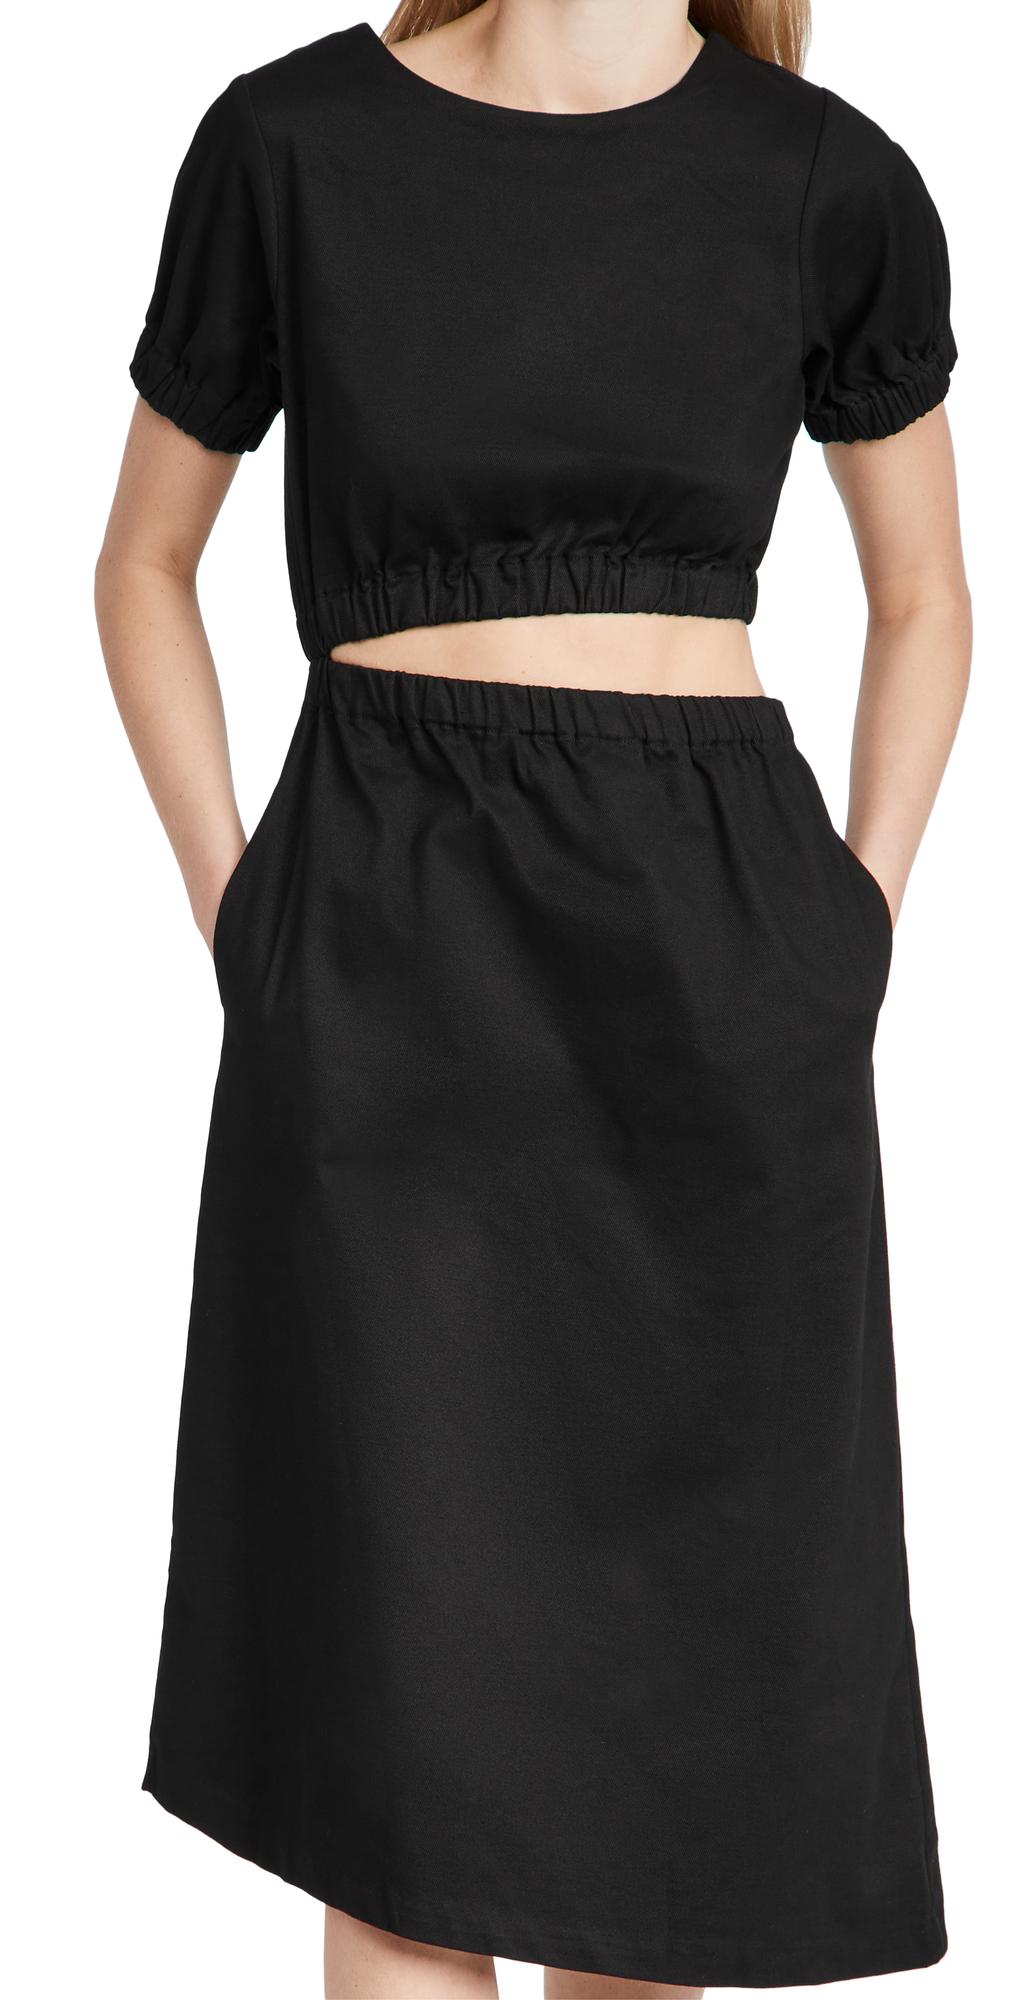 Harley Cutout Dress